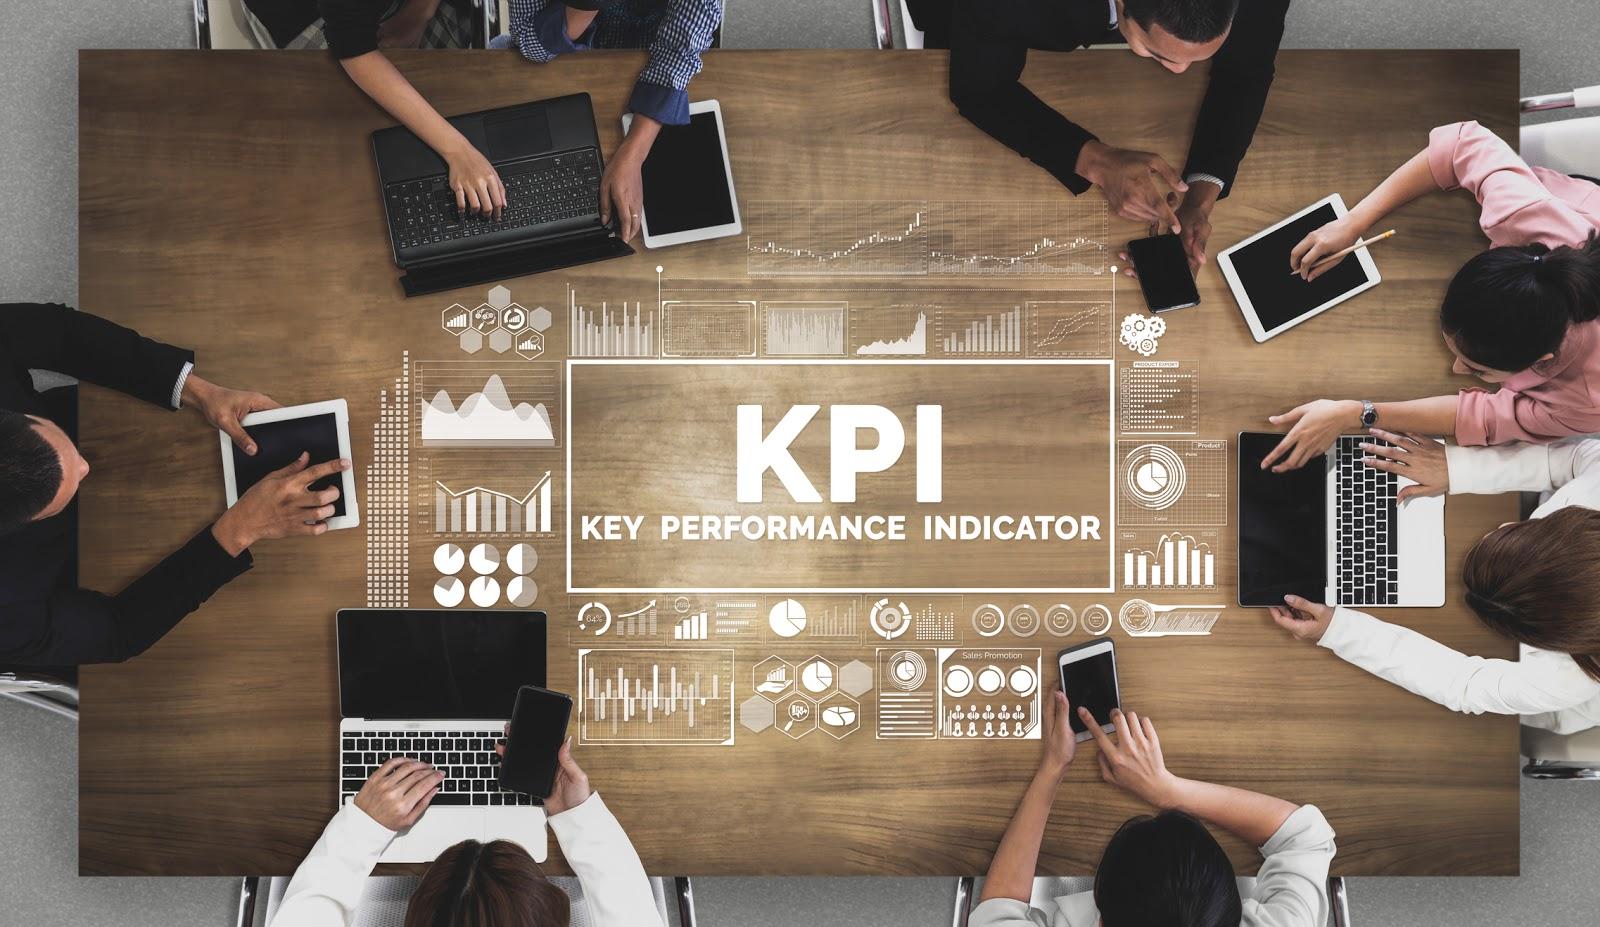 group measuring key performance indicators